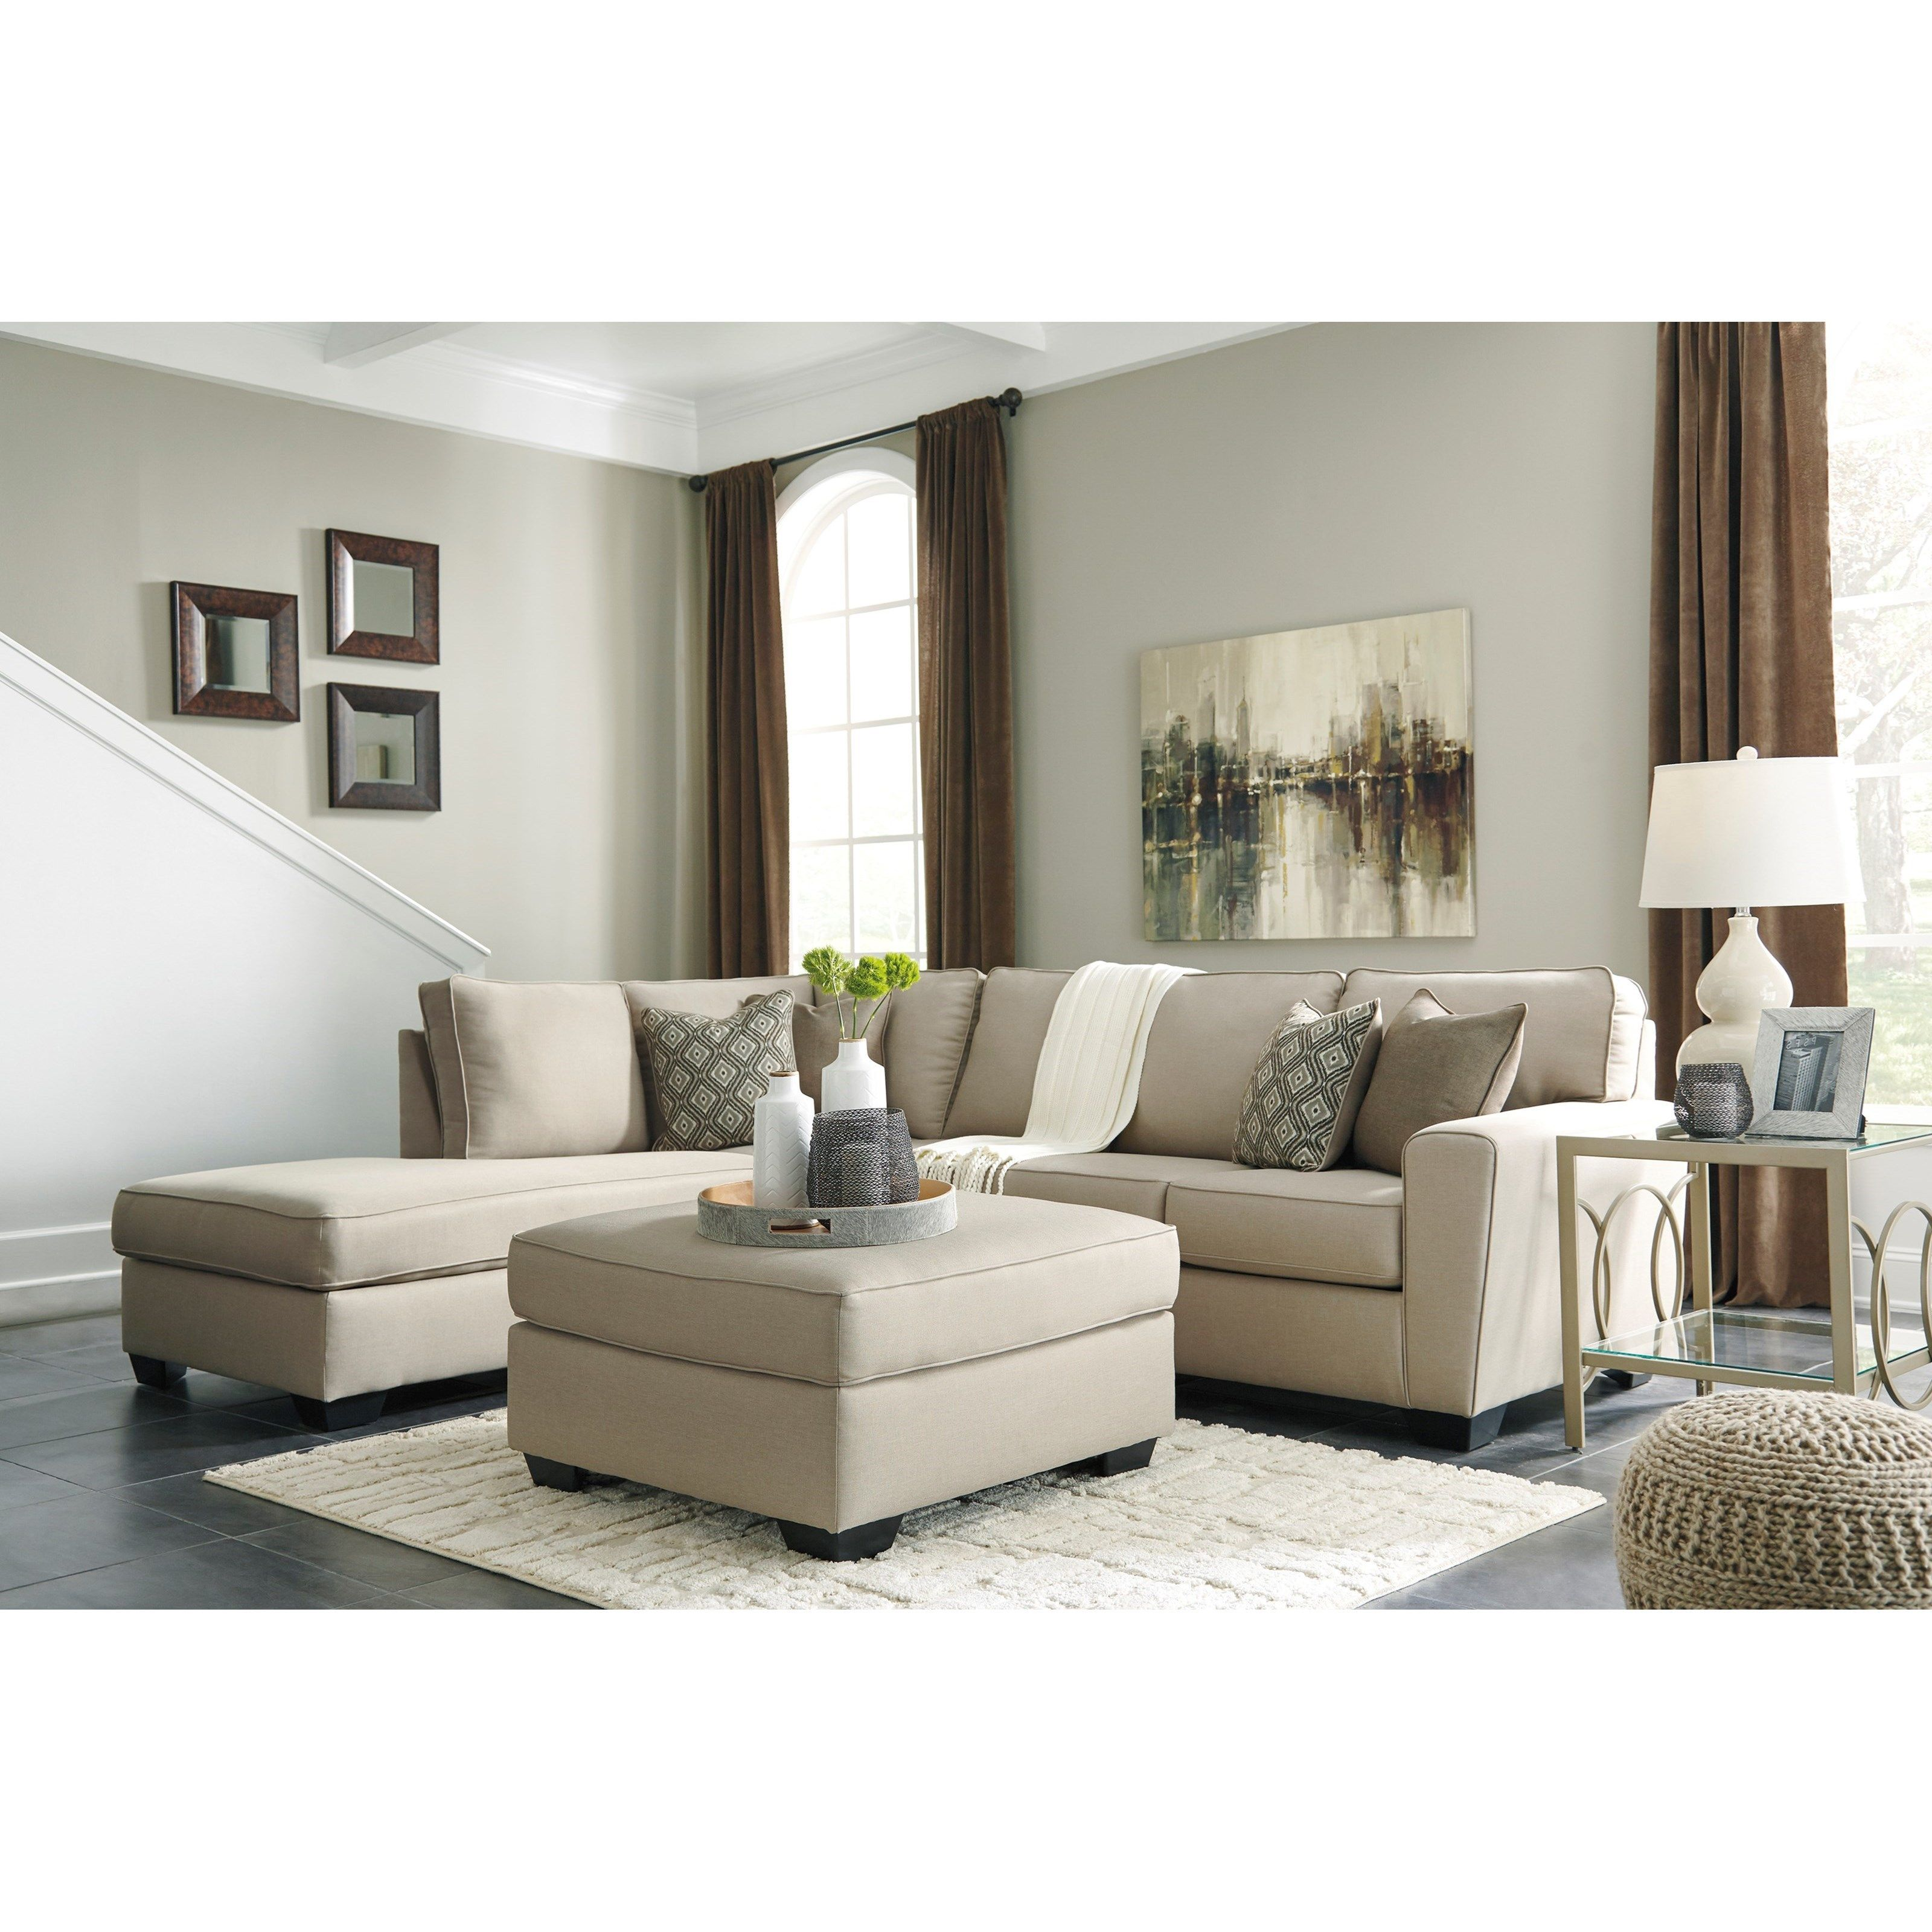 Benchcraft Calicho Stationary Living Room Group Wayside